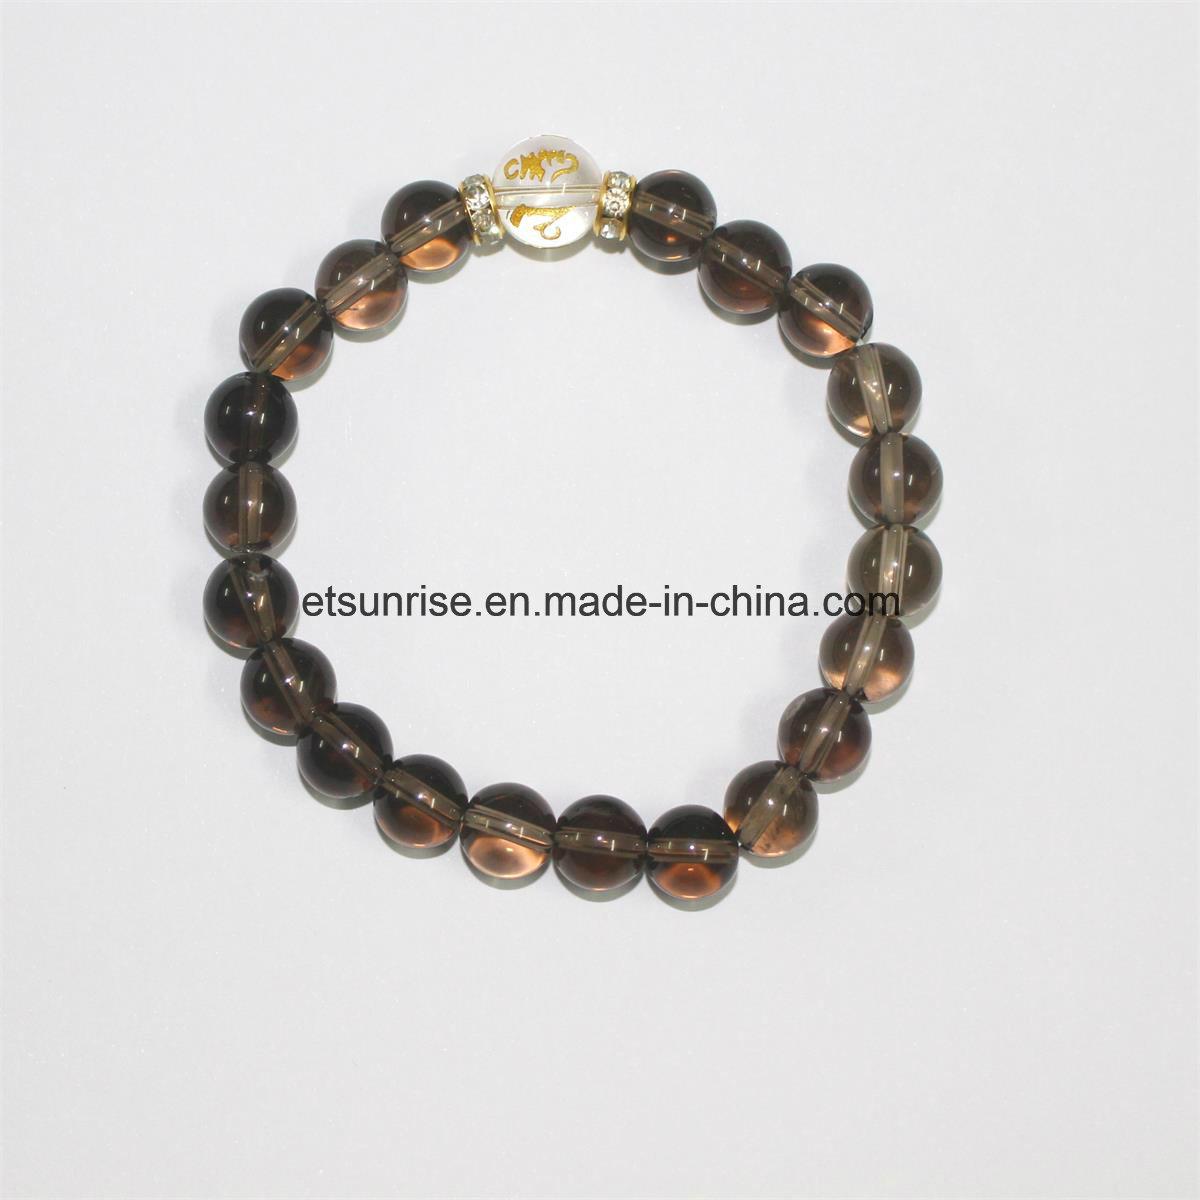 Fashion Natural Smoky Quartz Crystal Bracelet Bangles Jewelry